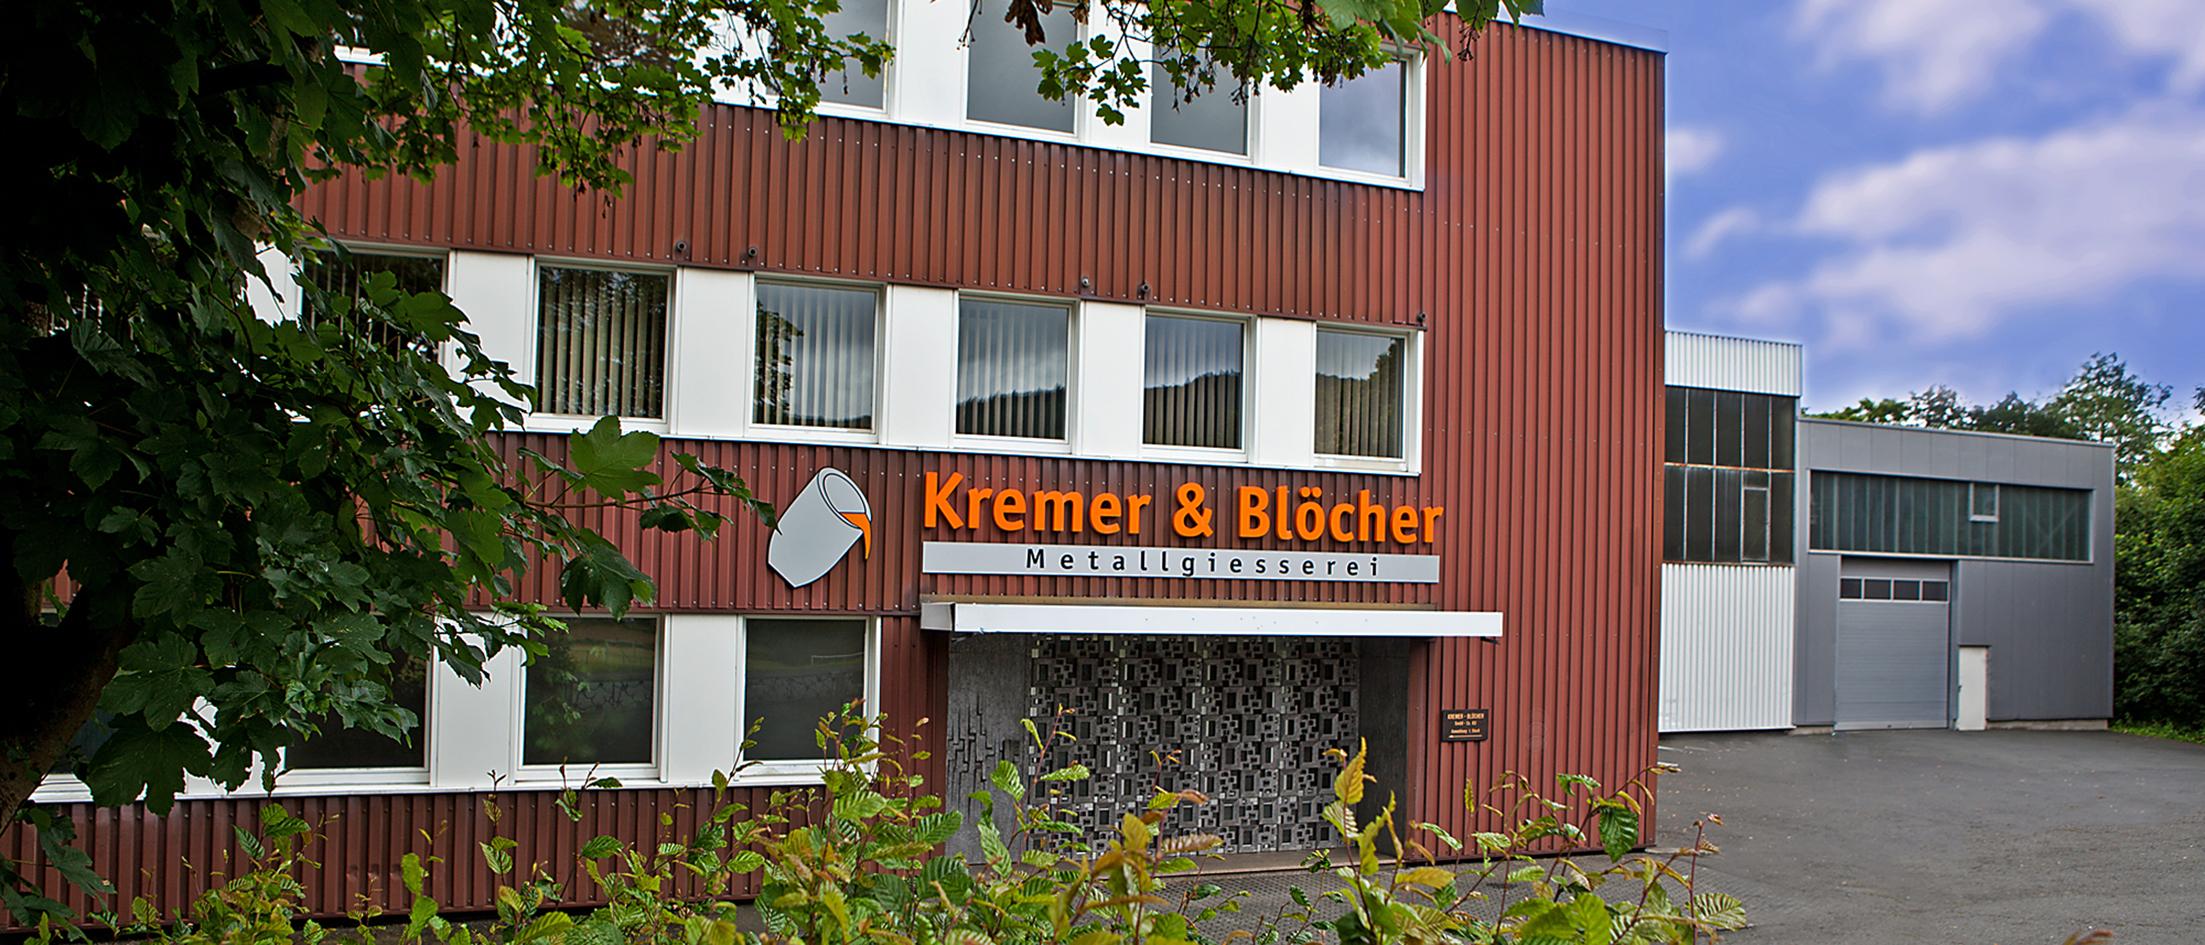 Kremer & Blöcher Metallgiesserei